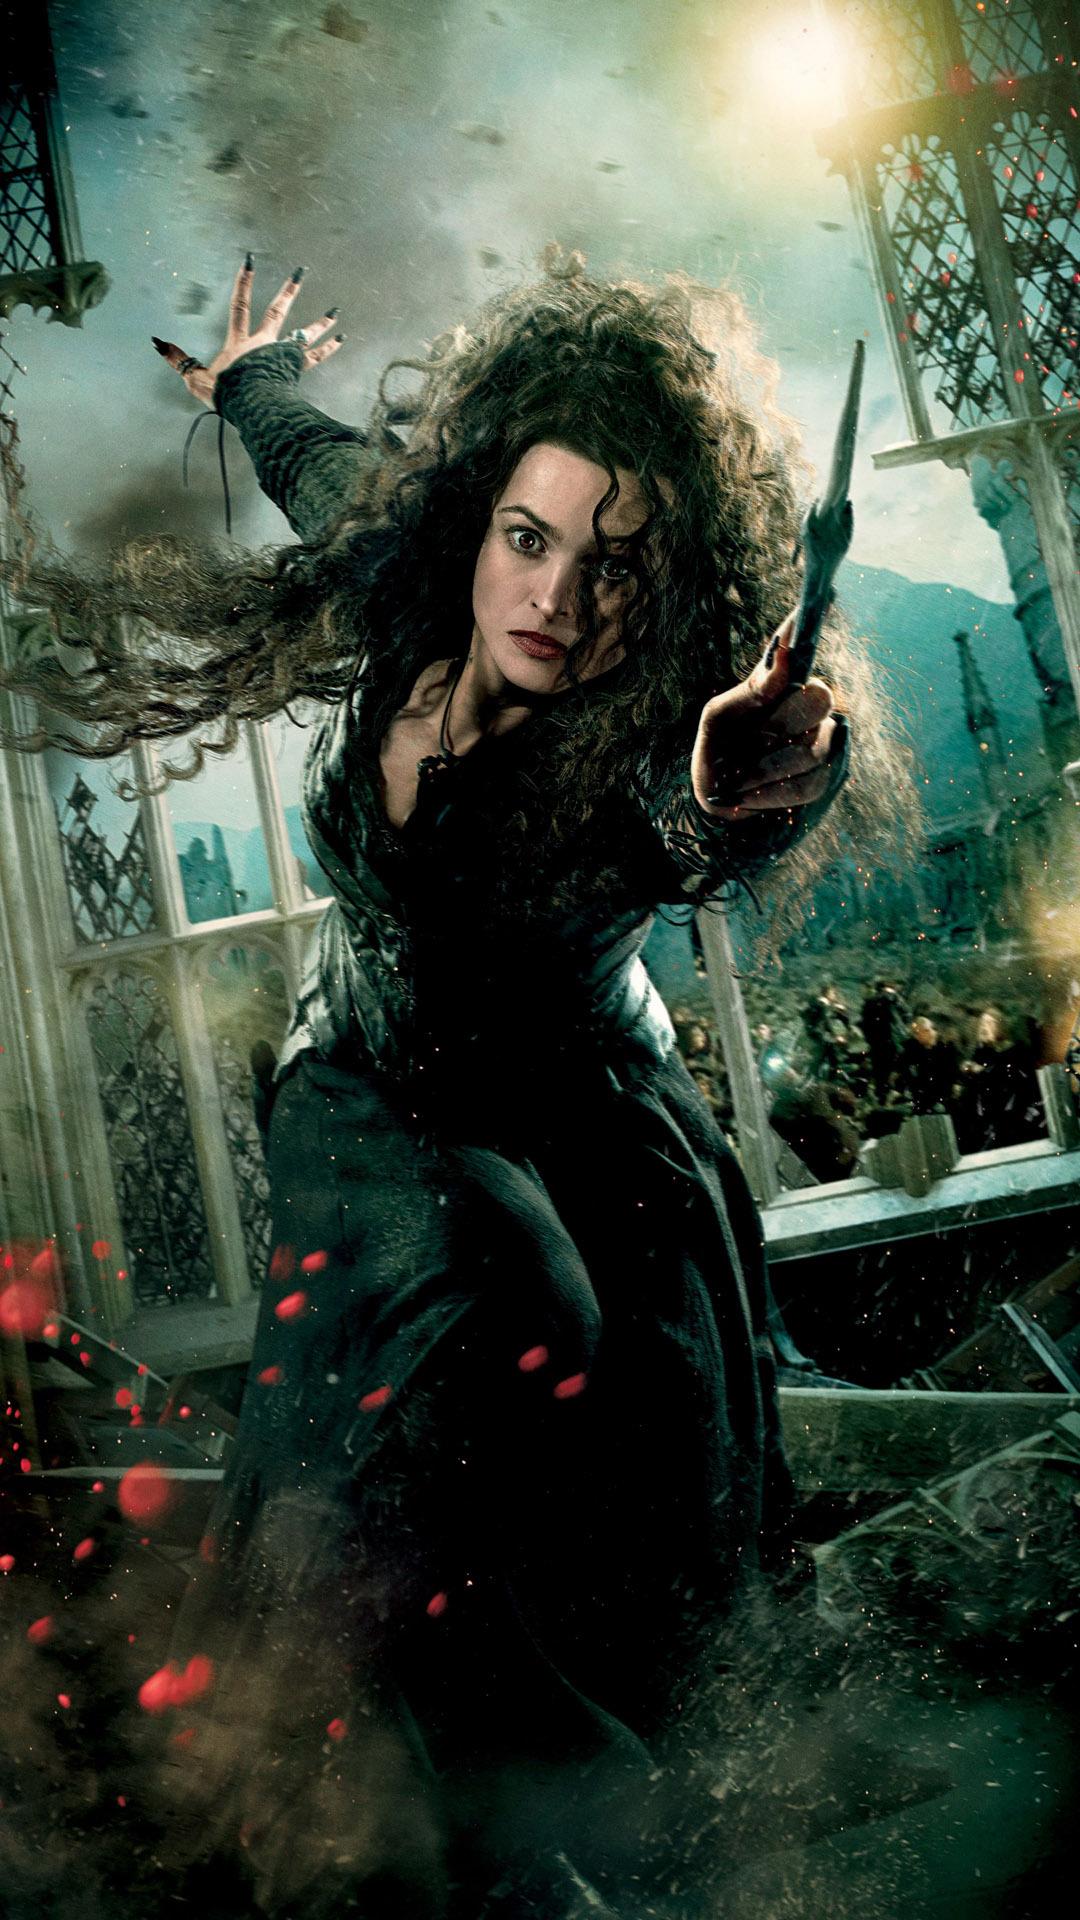 Fantastic Wallpaper Harry Potter Friend - Bellatrix-Lestrange-Harry-Potter-and-the-deathly-hallows-movie4  You Should Have_373917.jpg